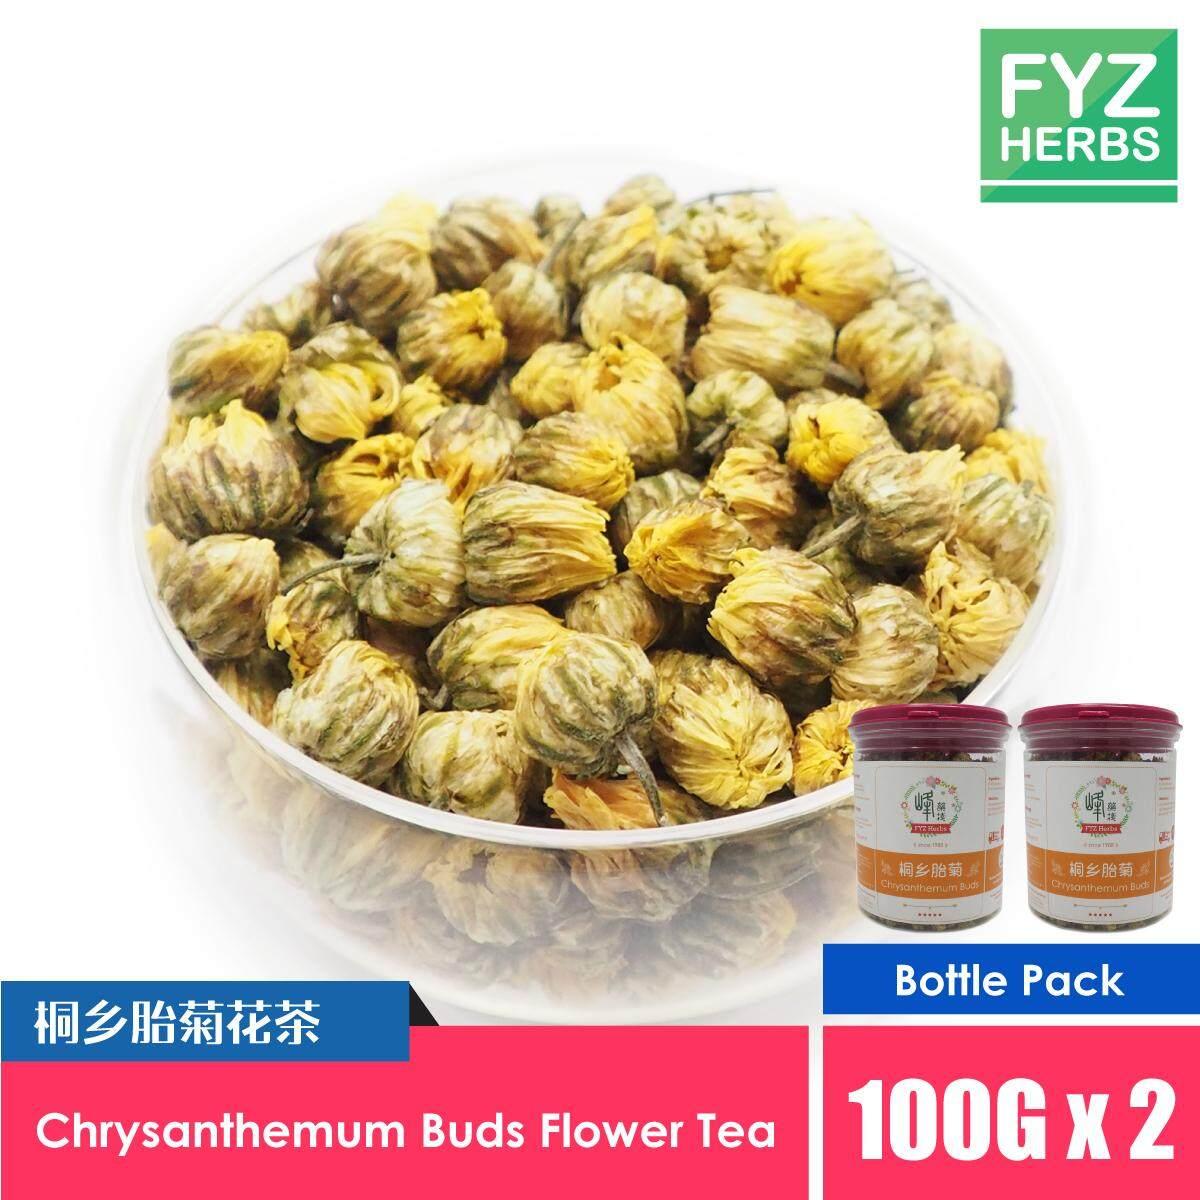 FYZ Herbs Chrysanthemum Bud Flower Tea (100g x 2) [Bottle Pack] 桐乡胎菊罐装 (100g x 2)